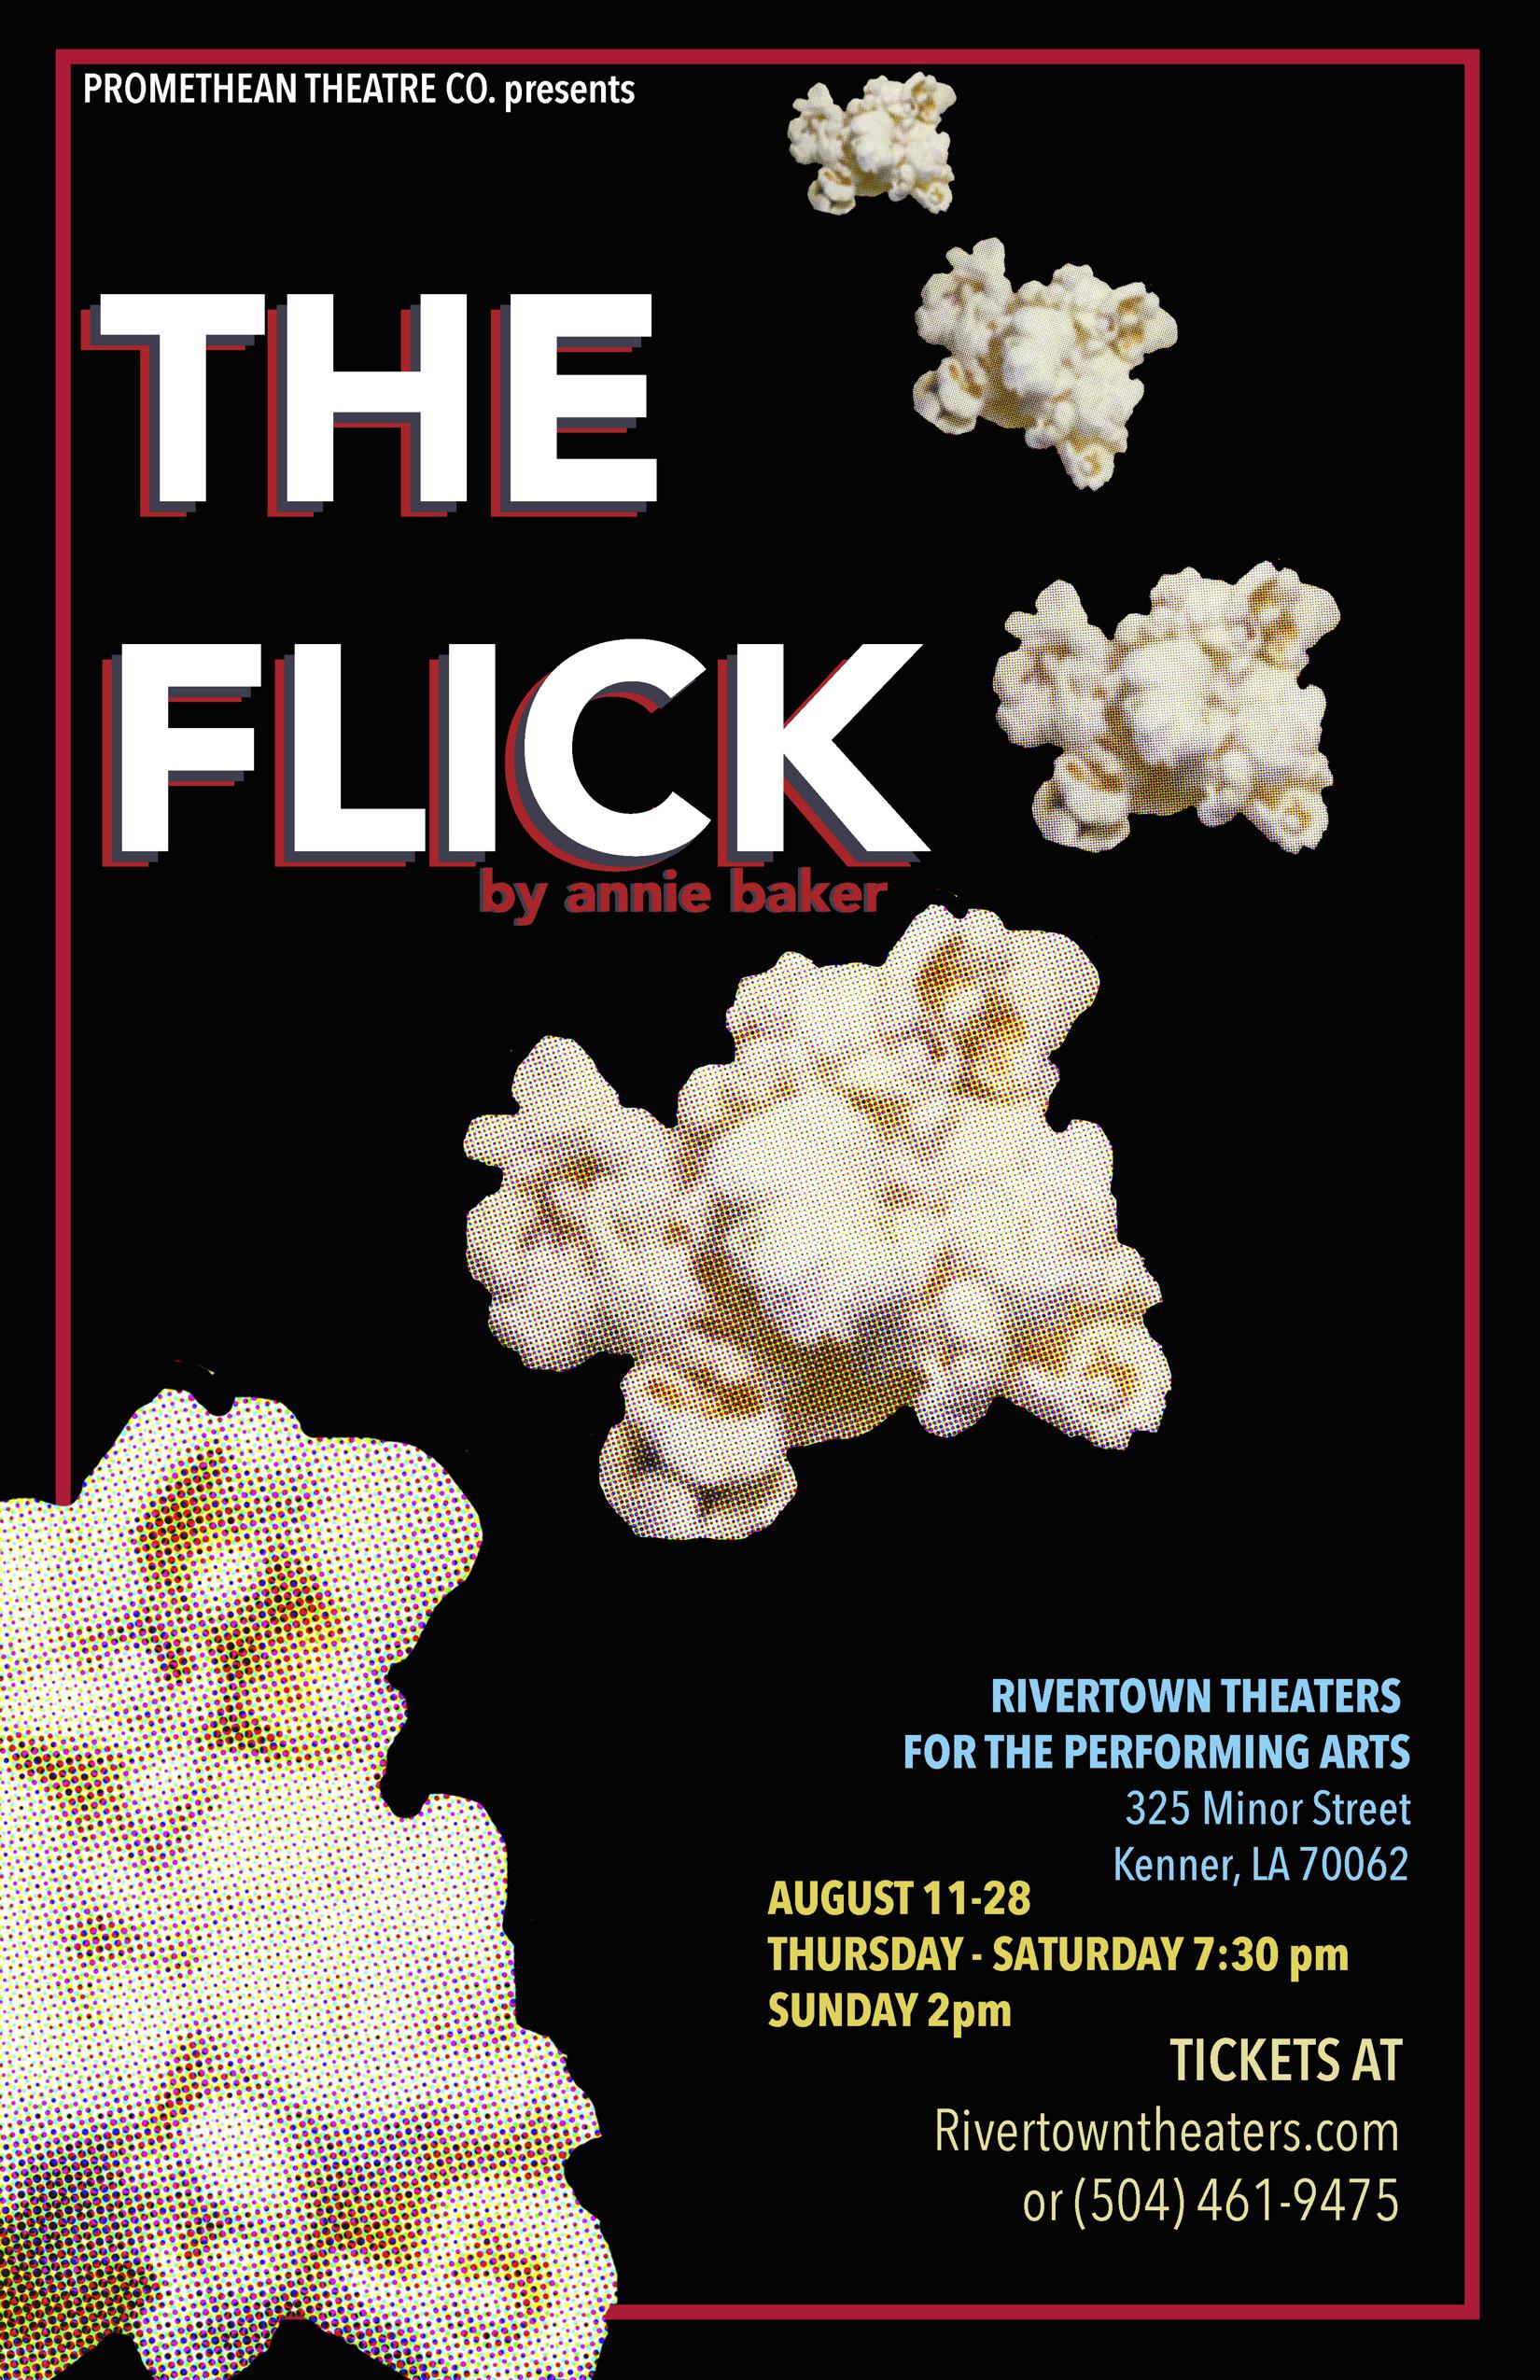 THE FLICK Poster.jpg